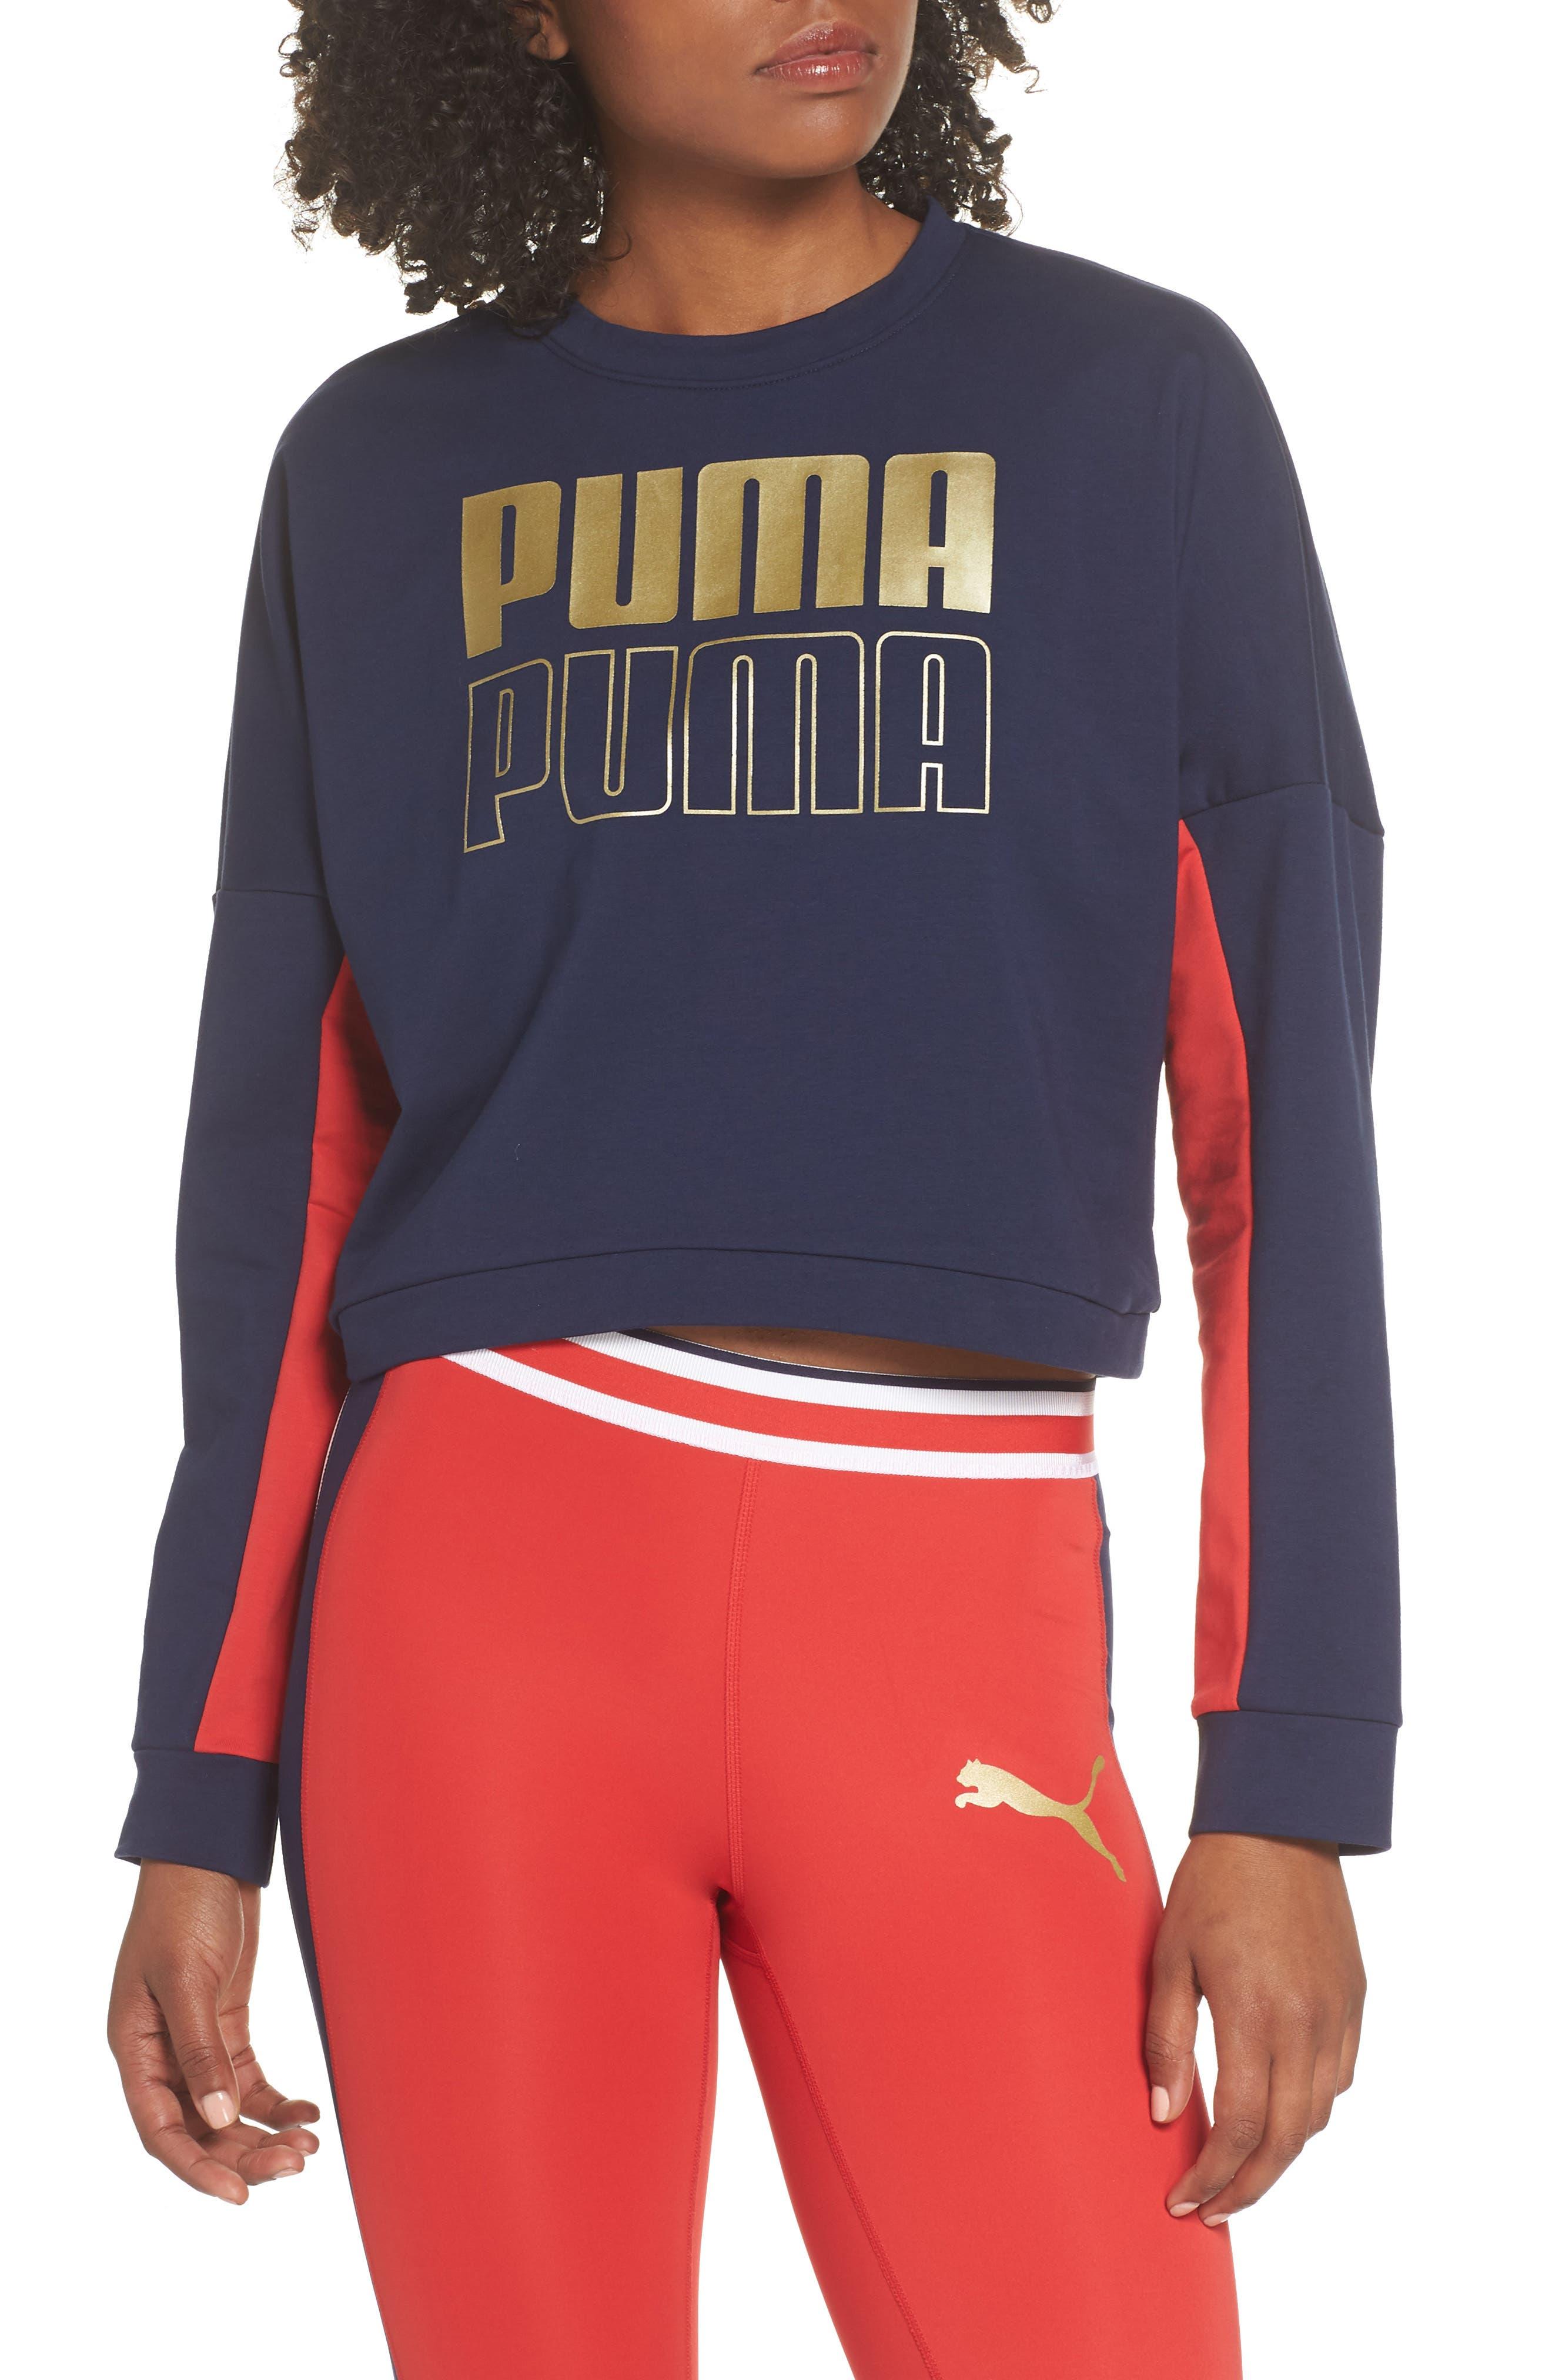 Modern Sport Sweatshirt,                             Main thumbnail 1, color,                             710